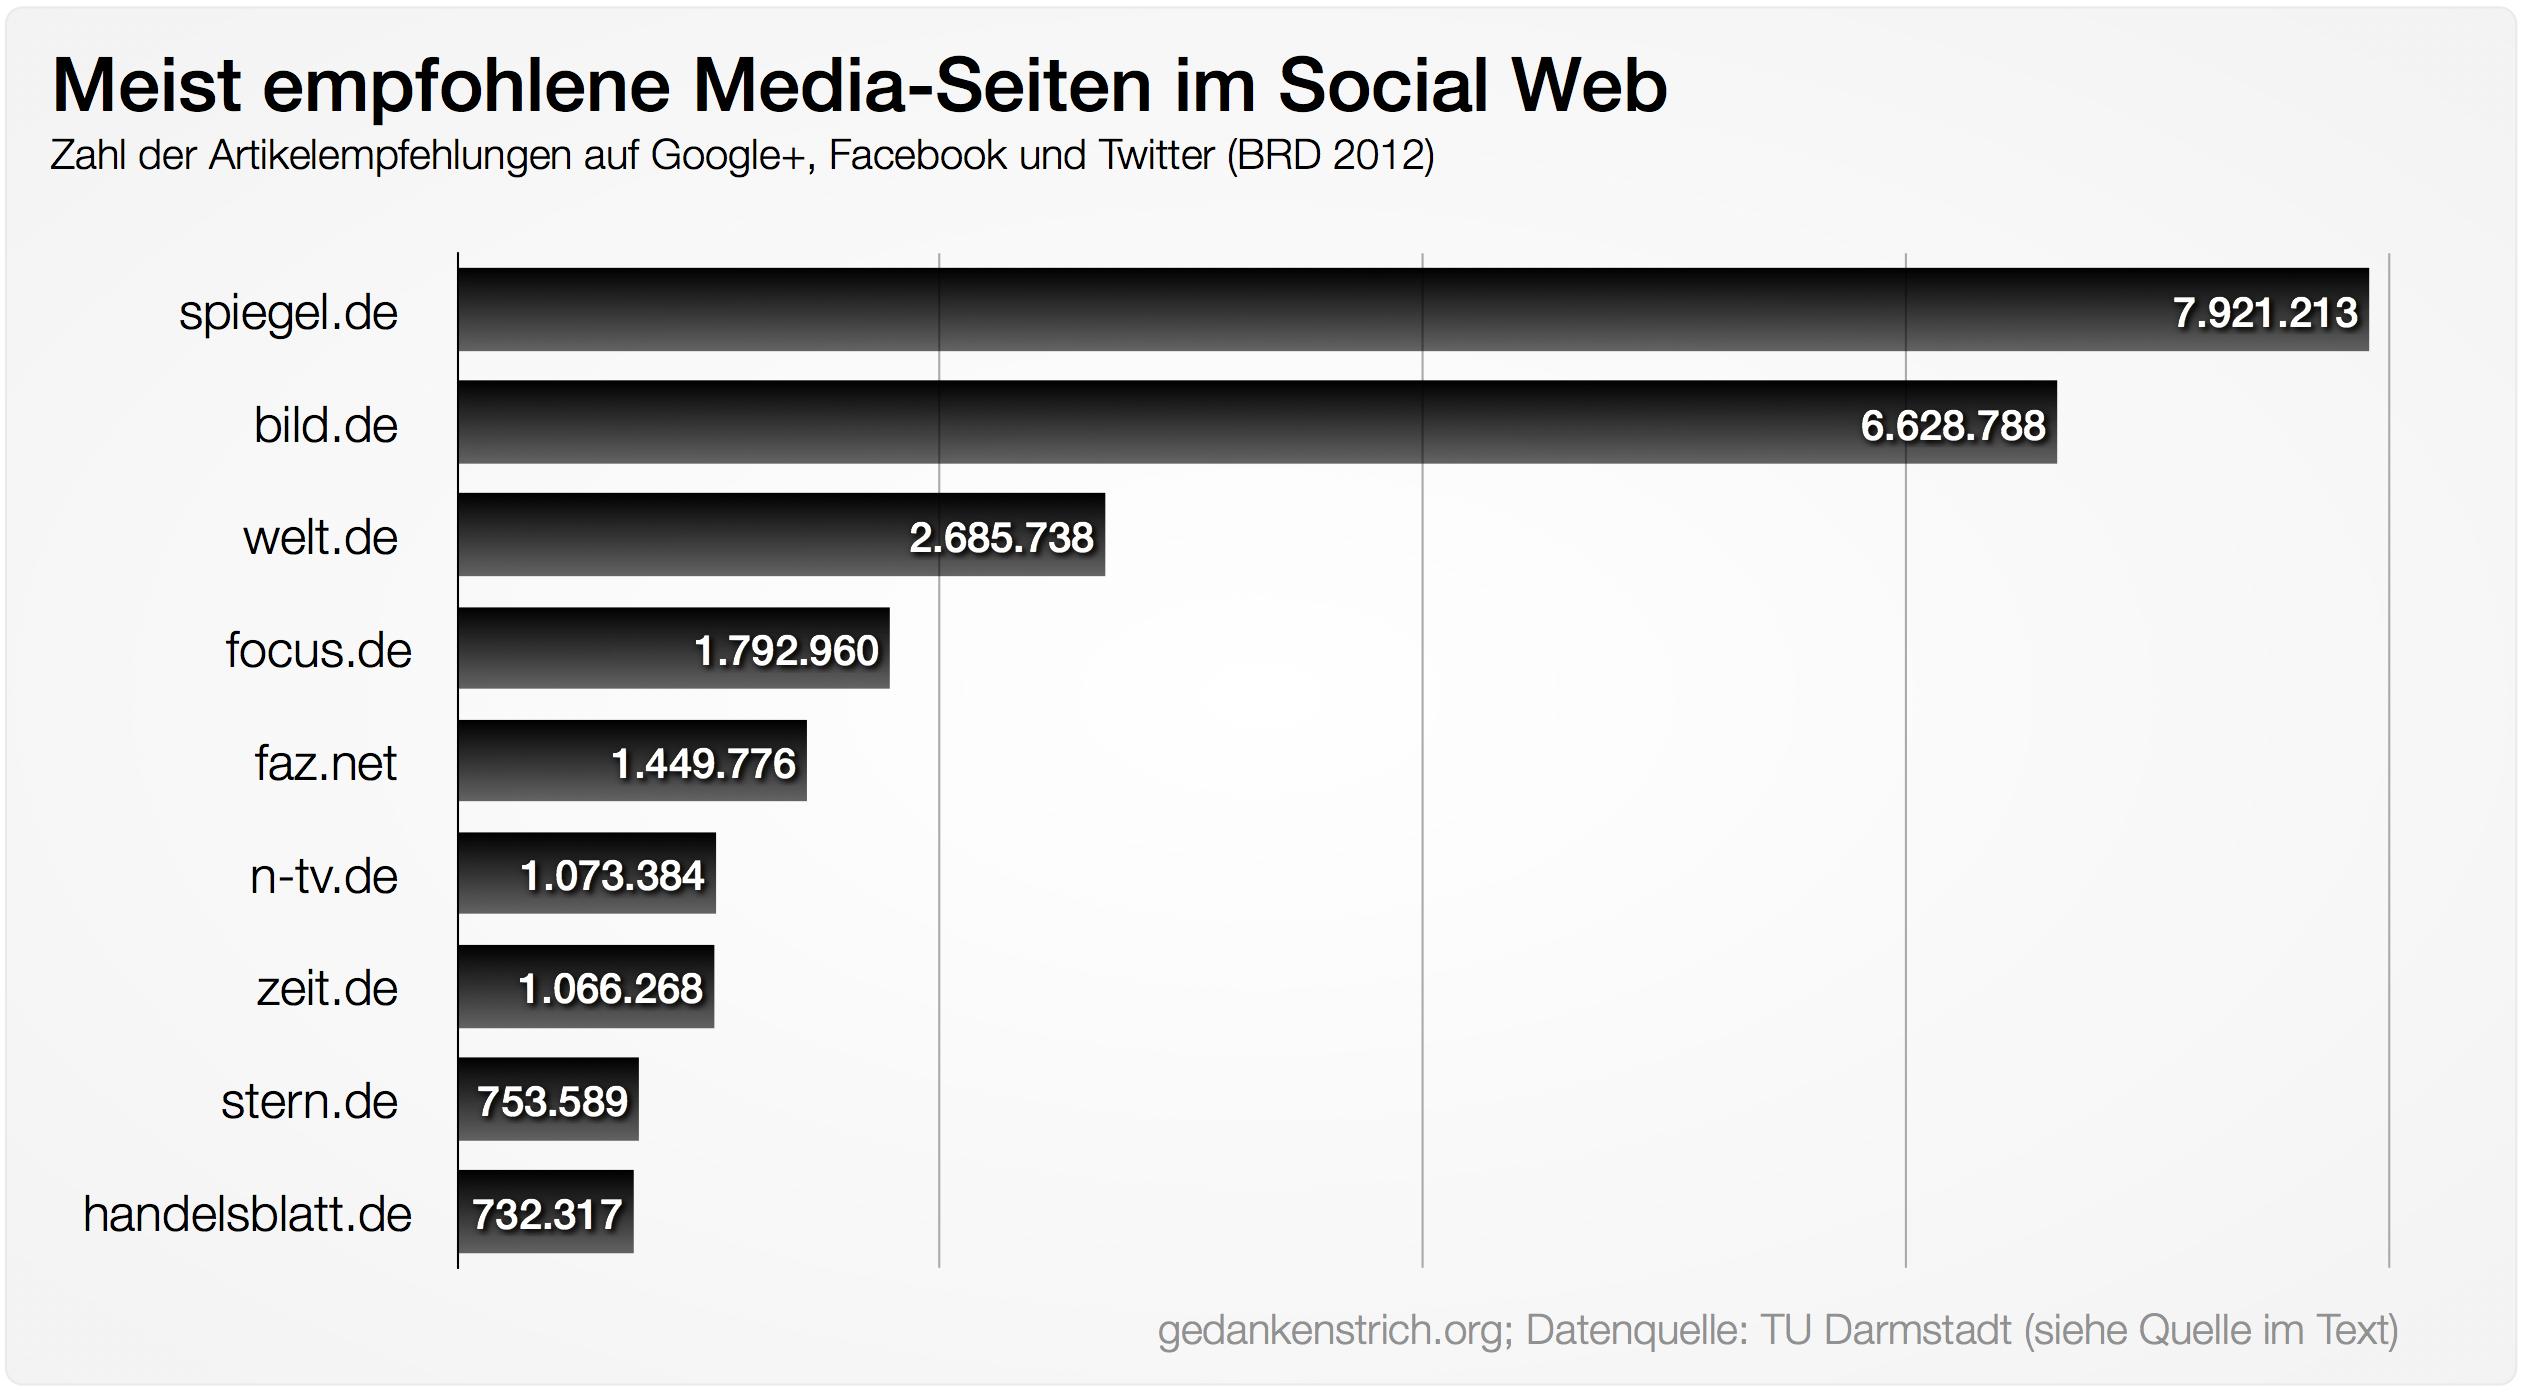 meistemphohlen–social-web